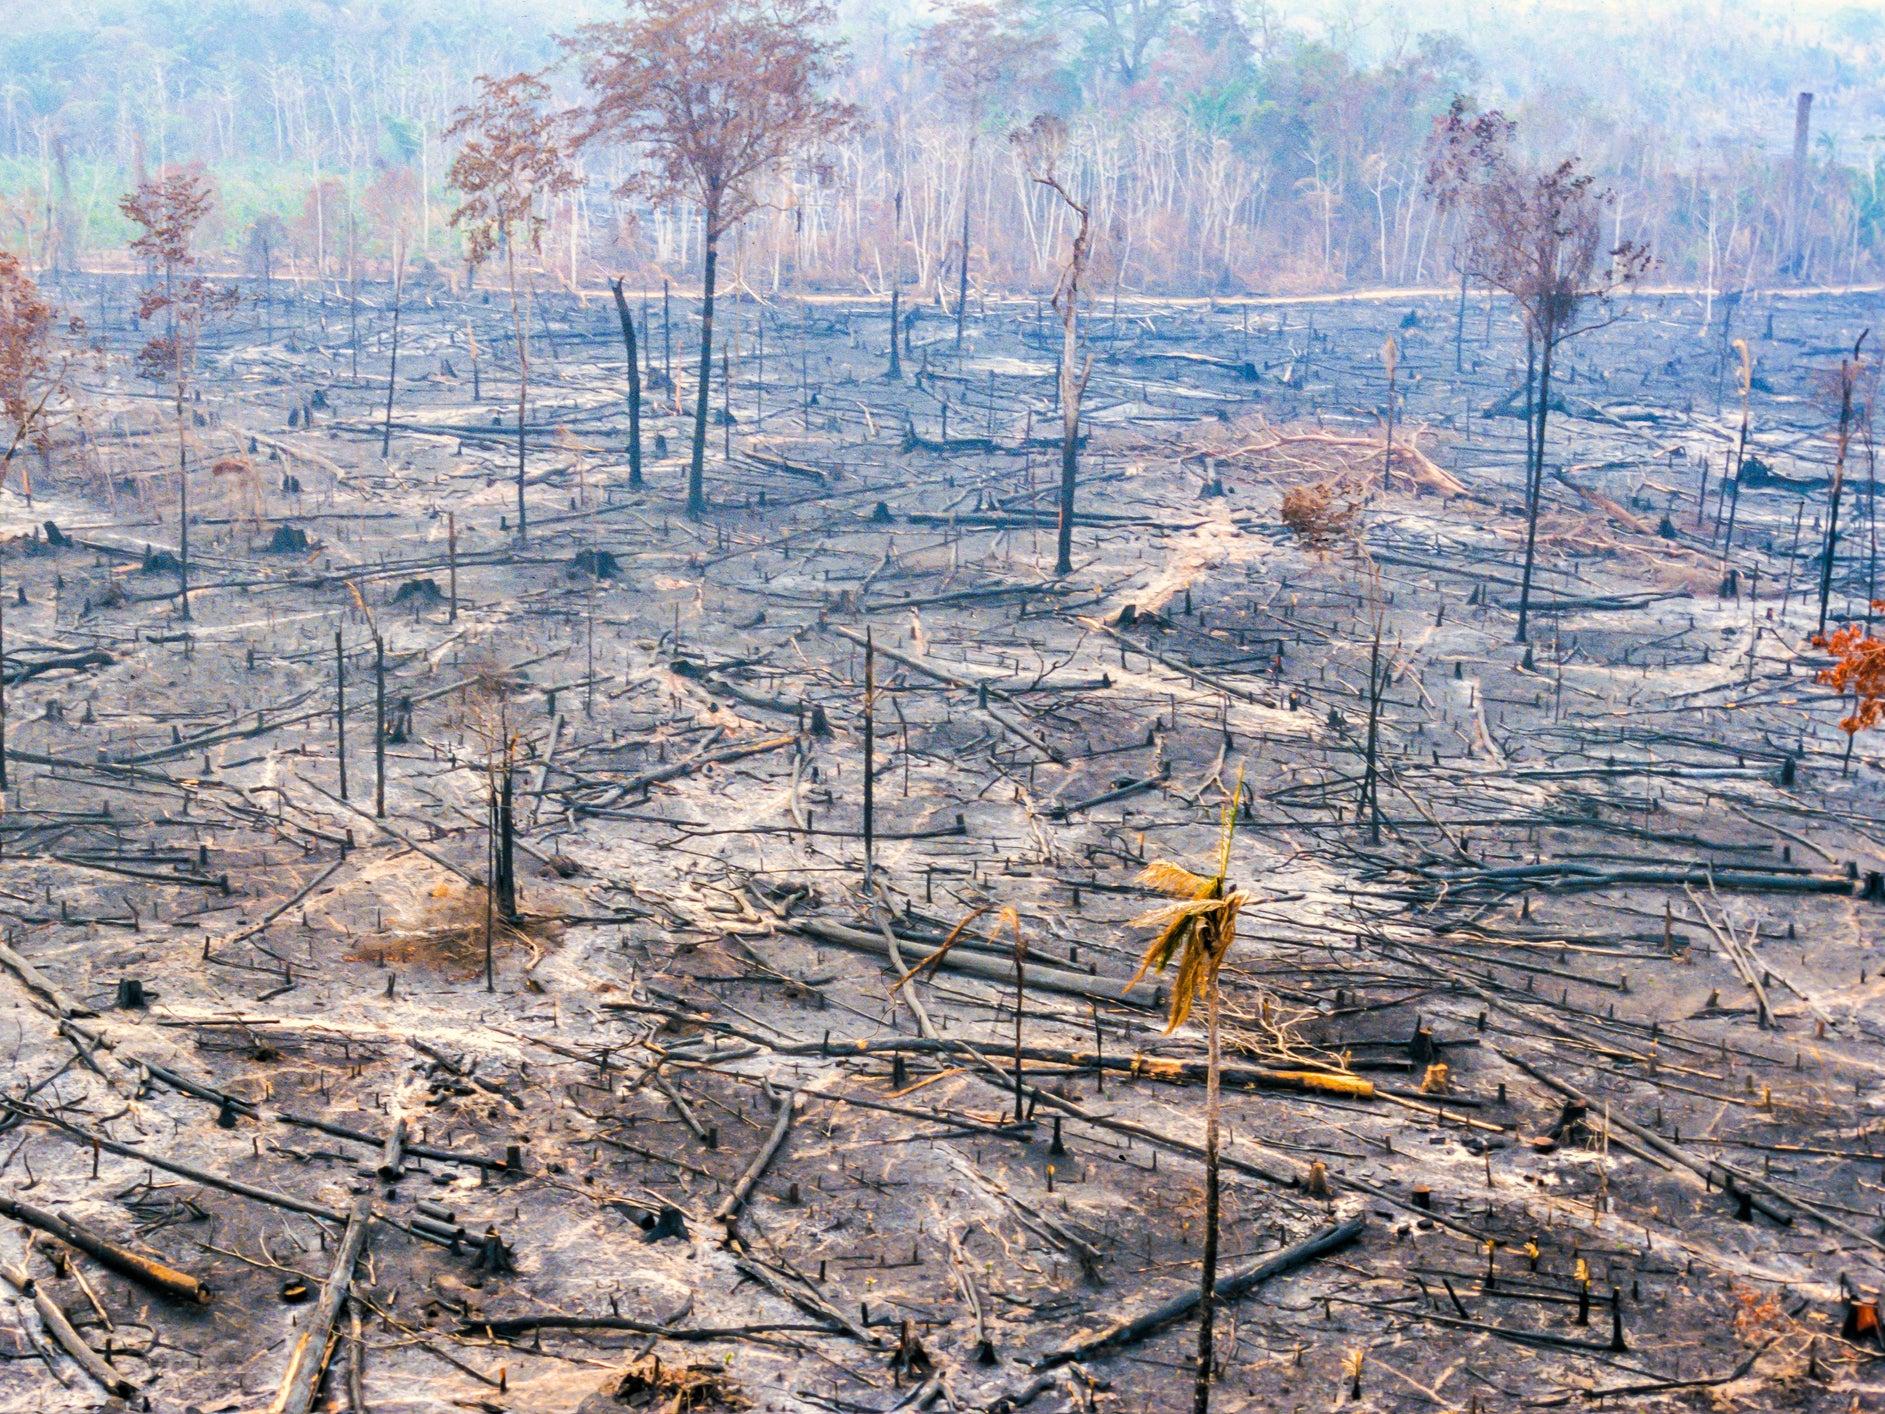 Biodiversity crisis: US, China, Australia and Brazil refuse to sign pledge to reverse damage to natural world